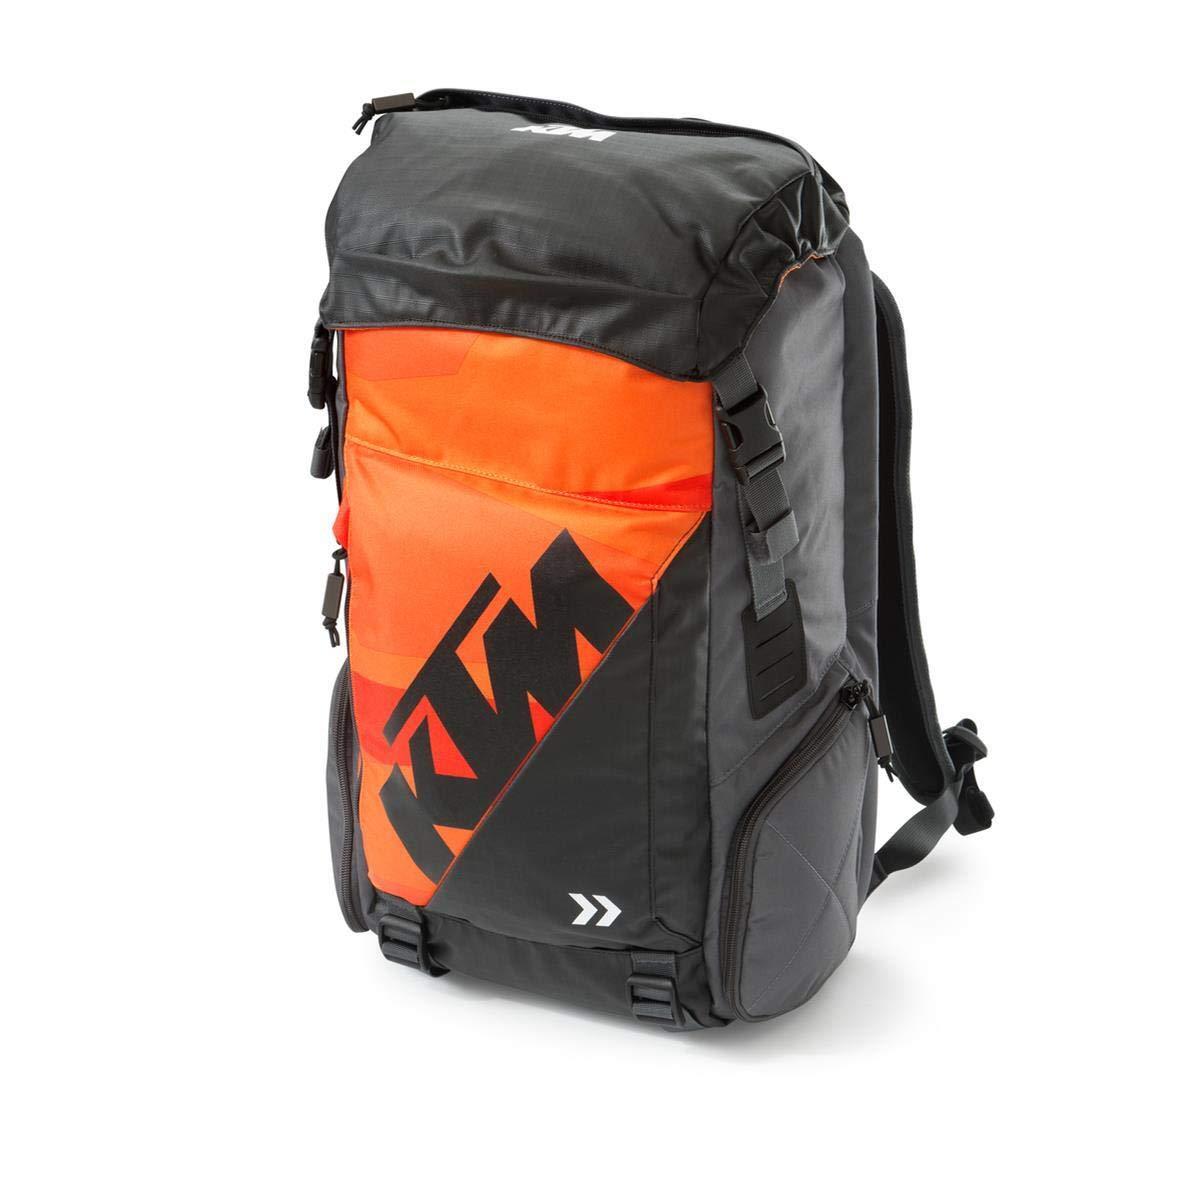 NEW KTM ORANGE BACKPACK (3PW200024100)